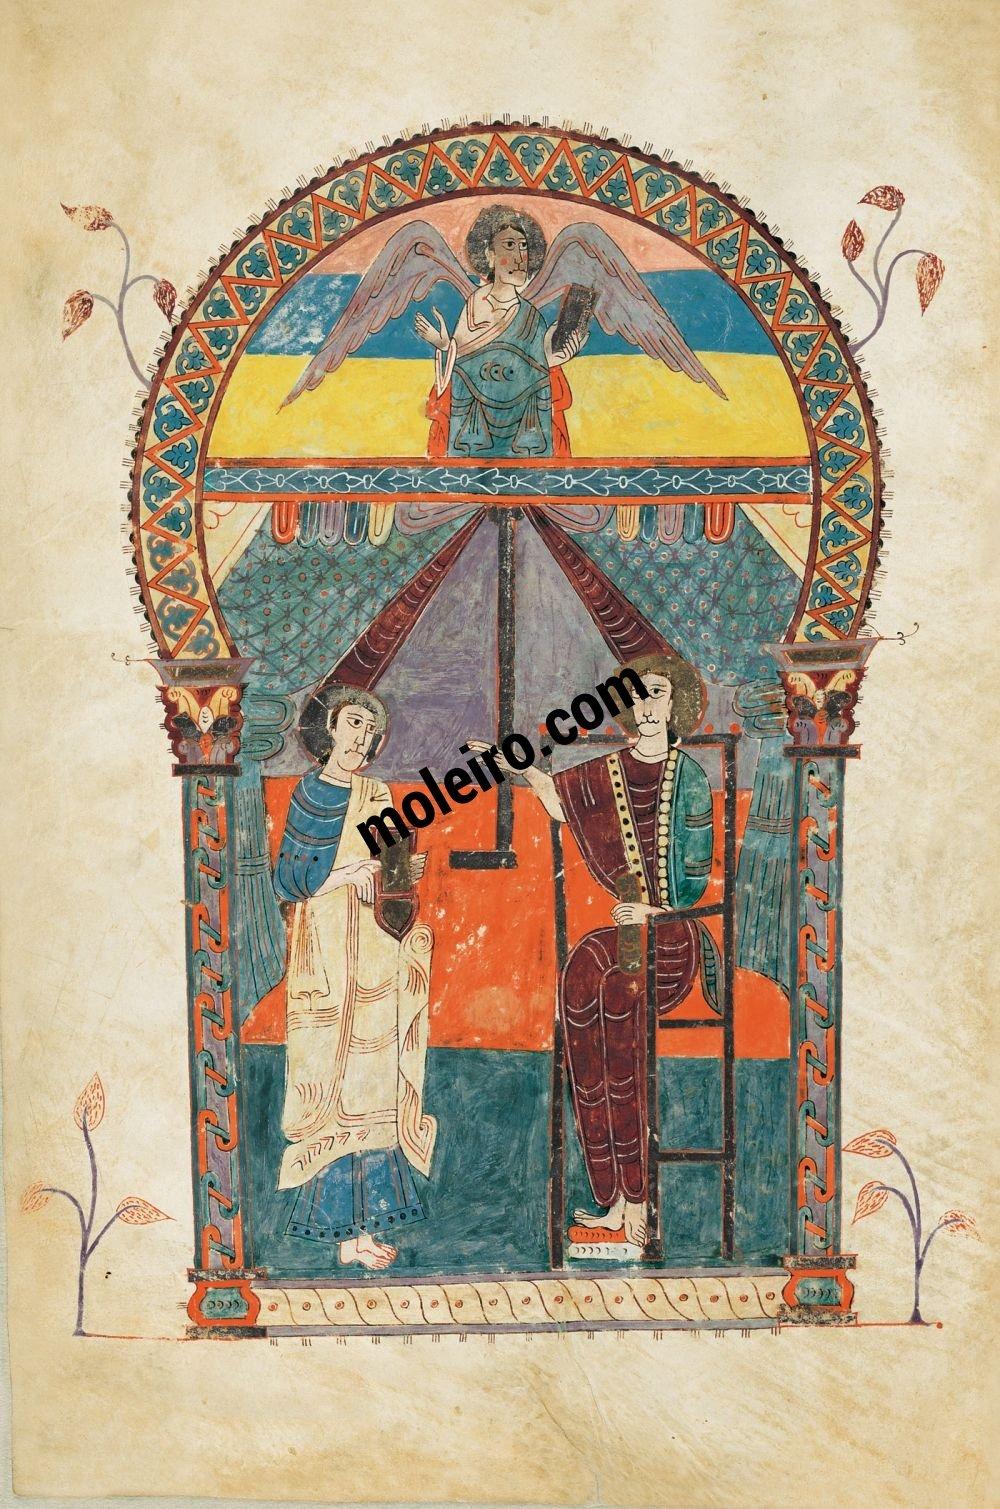 Beato de Liébana, códice del Monasterio de San Salvador de Tábara, Zamora f. 6v, Retrato de san Juan con el testigo